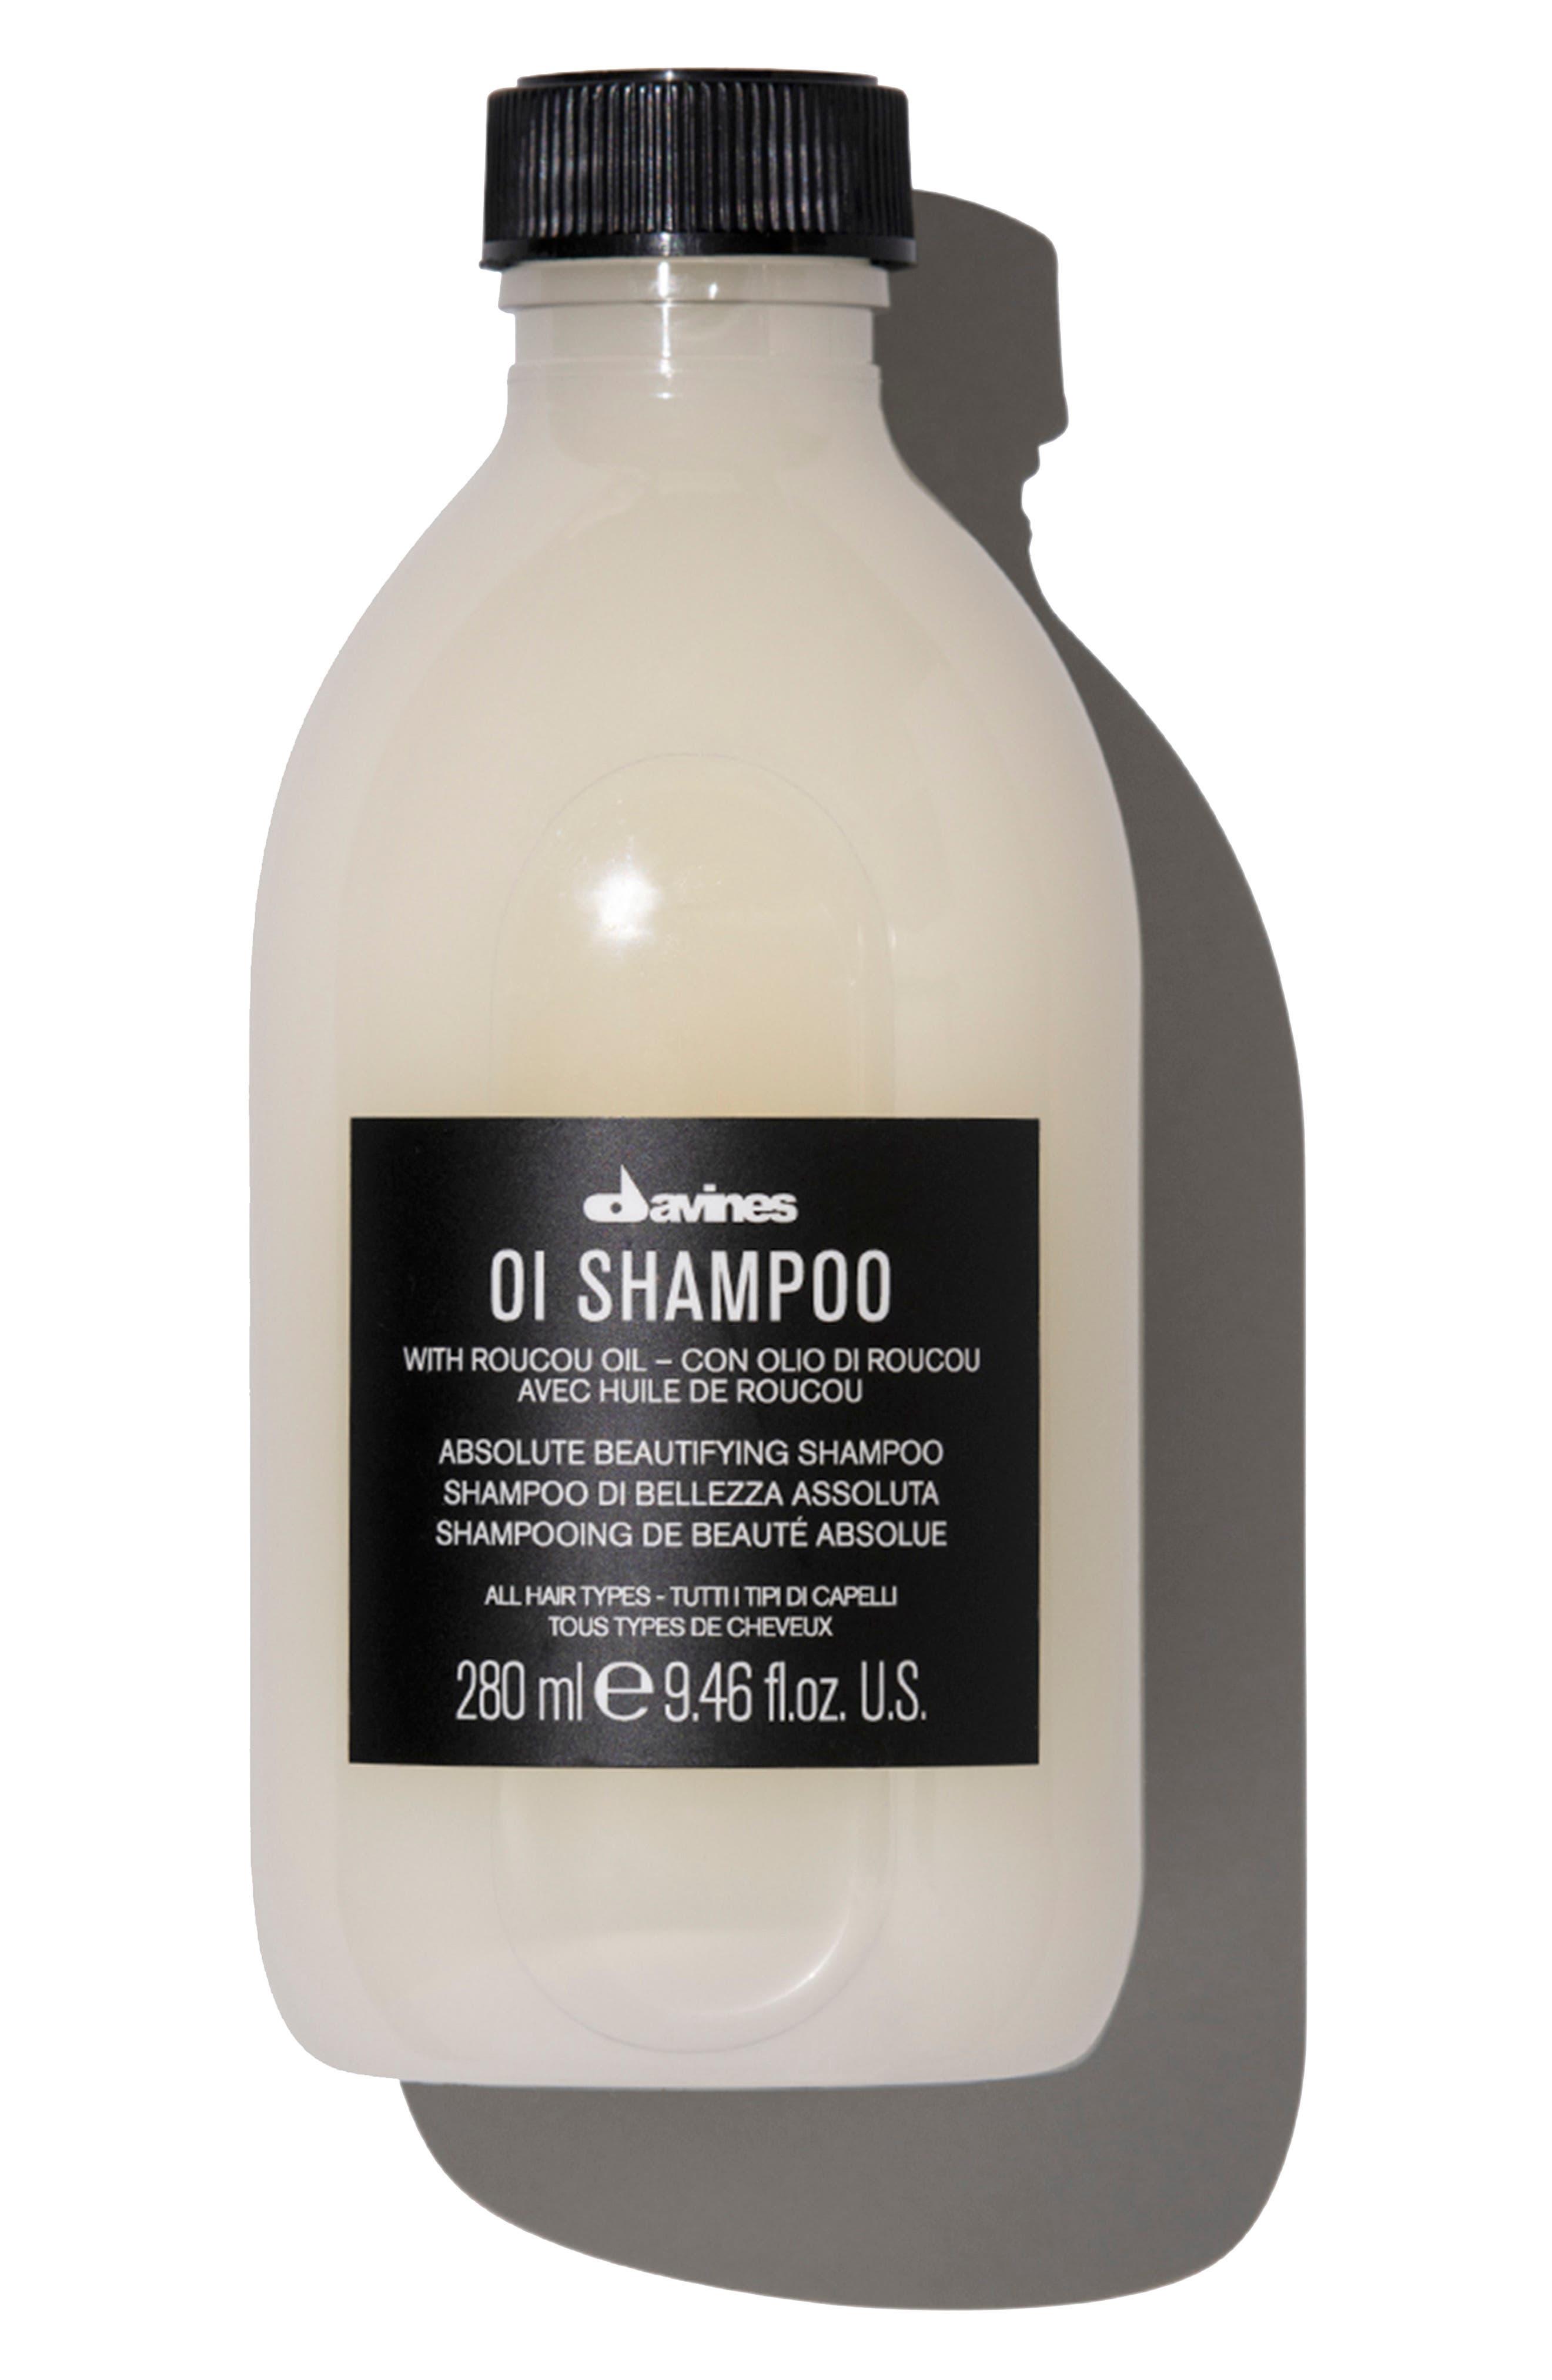 Davines OI Shampoo at Nordstrom